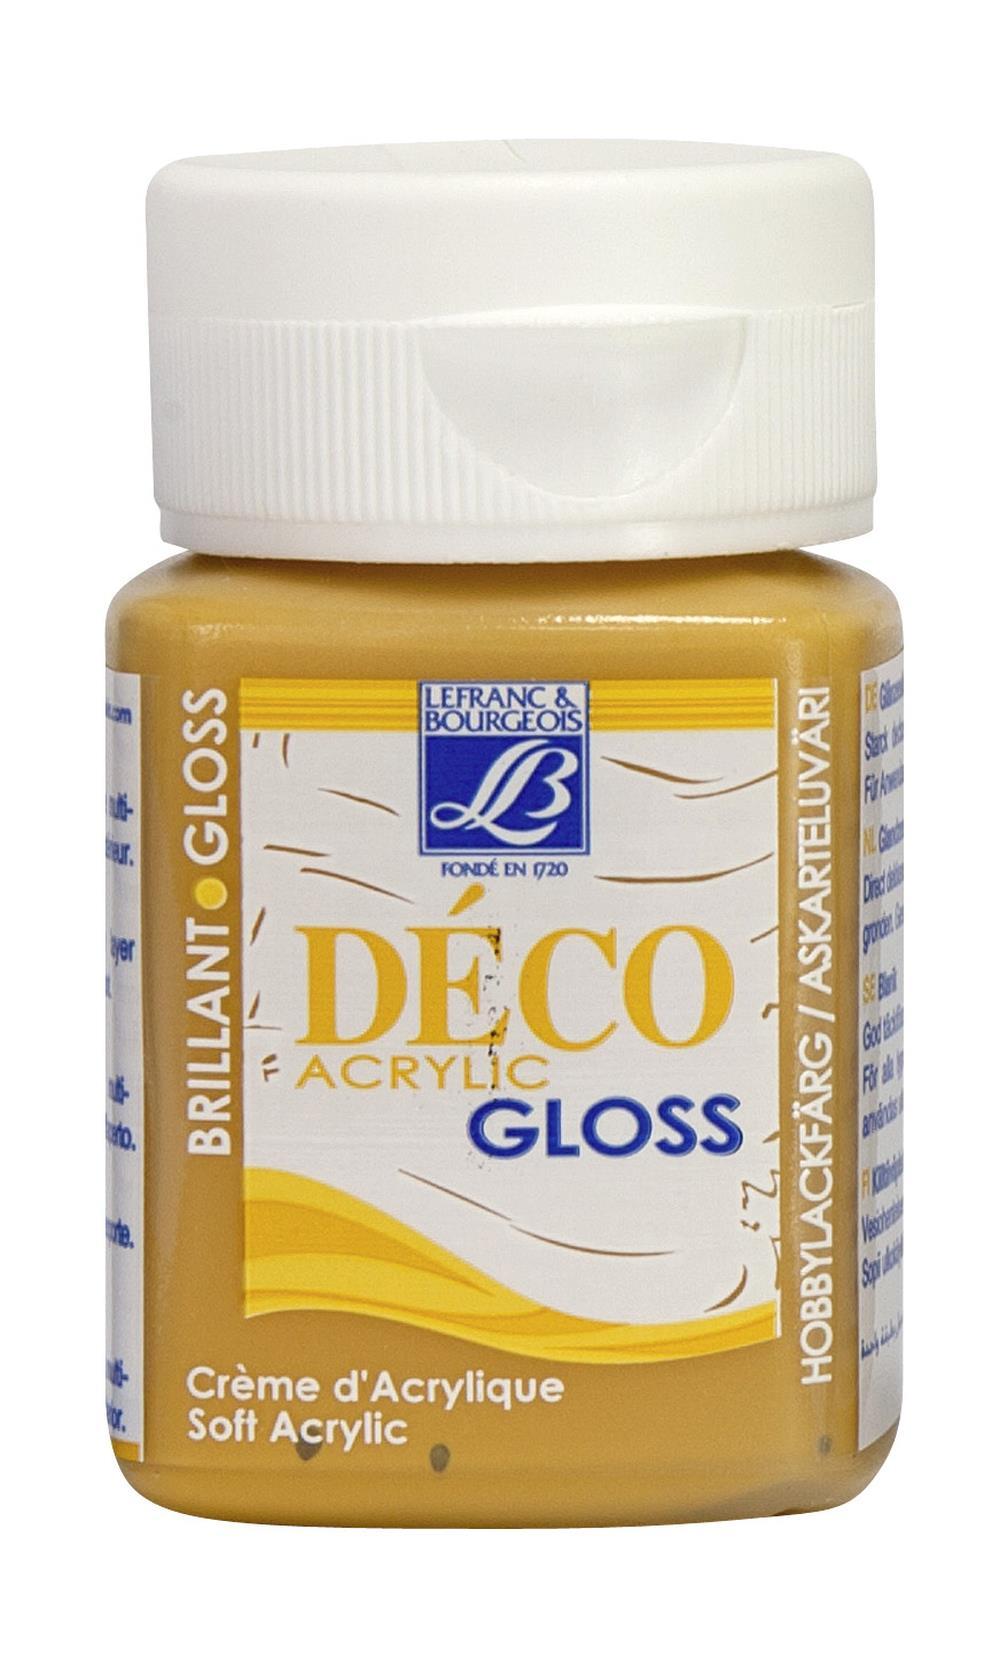 Hobbyfärg L&B Deco Gloss Akryl 50ml  Caramel 118 (4F) Utgår